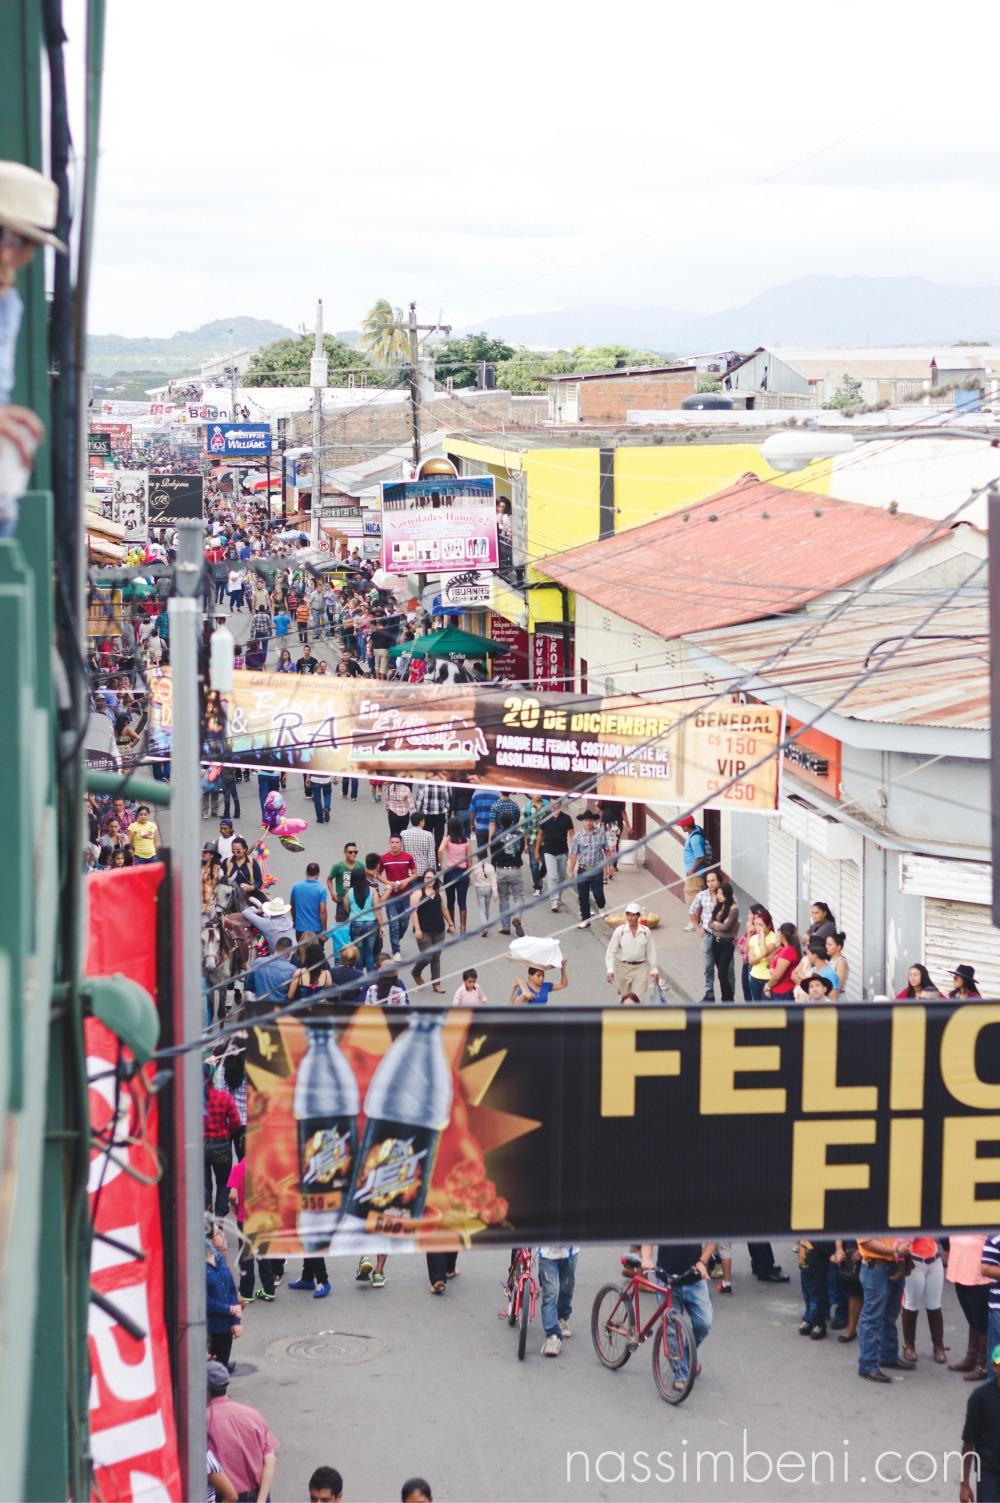 los hipicos festical in esteli nicaragua